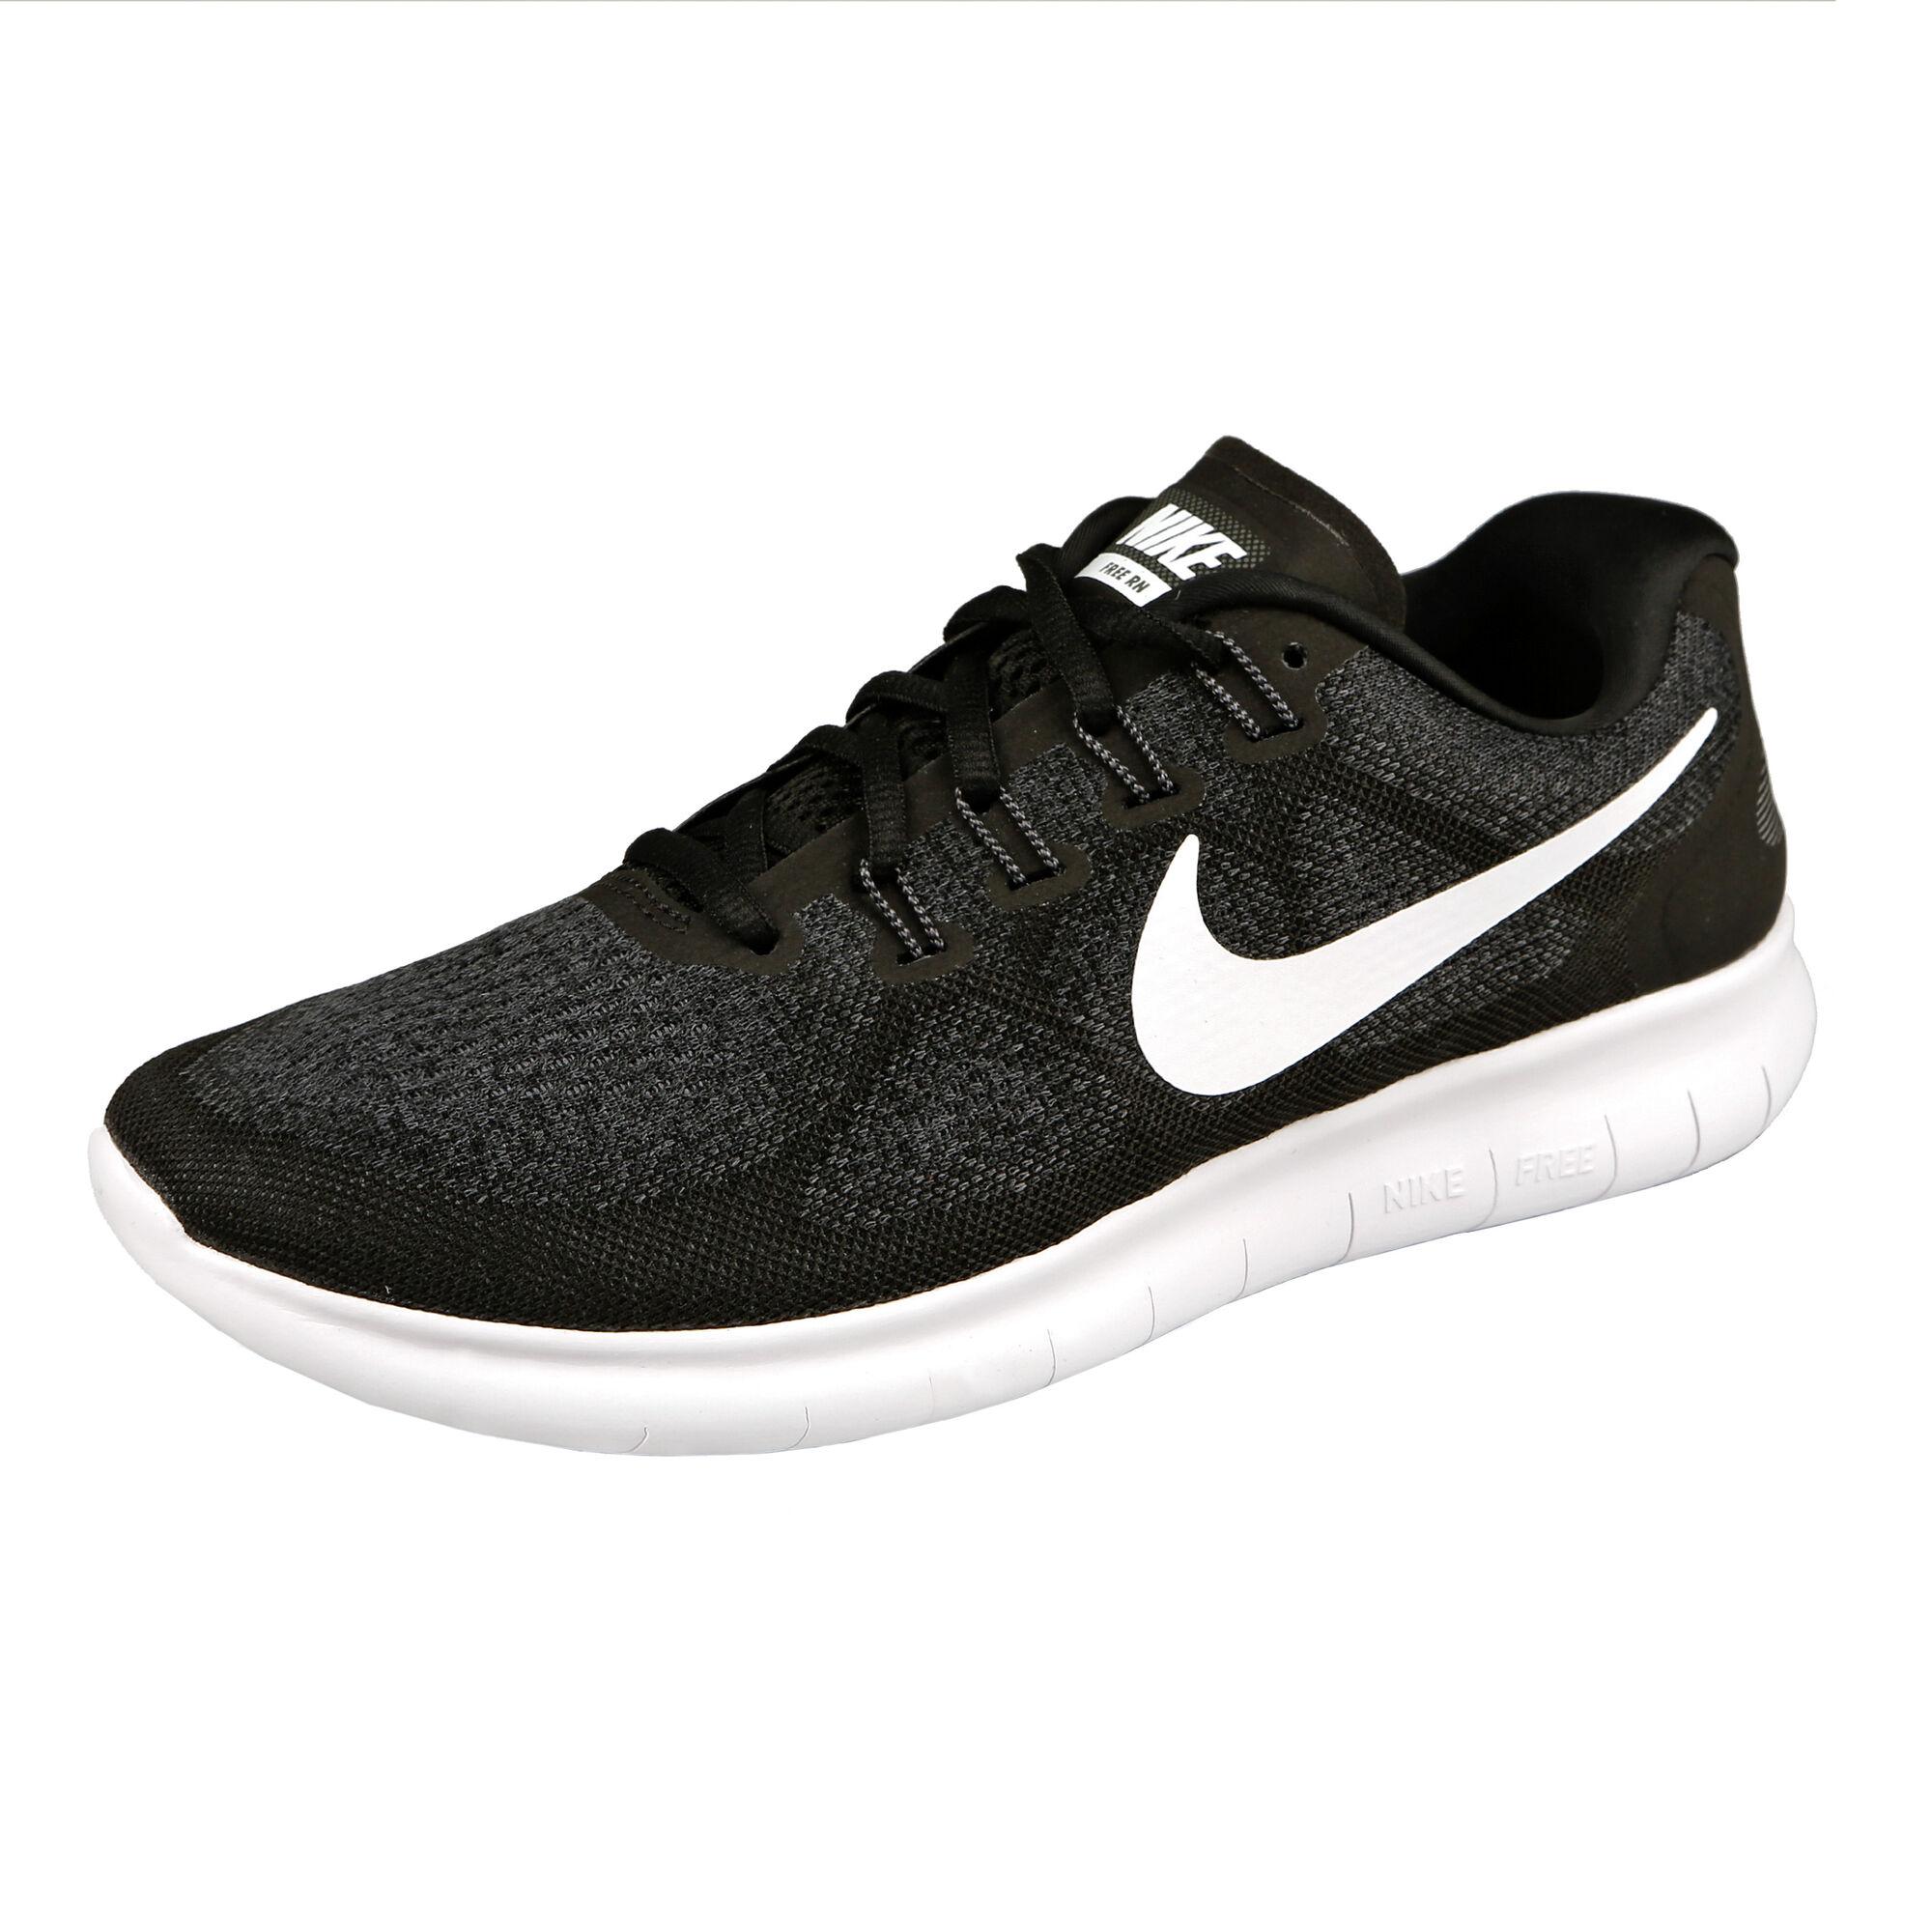 on sale 94f0f f5bb6 Nike Free 2017 Fitness Shoe Women - Black, White